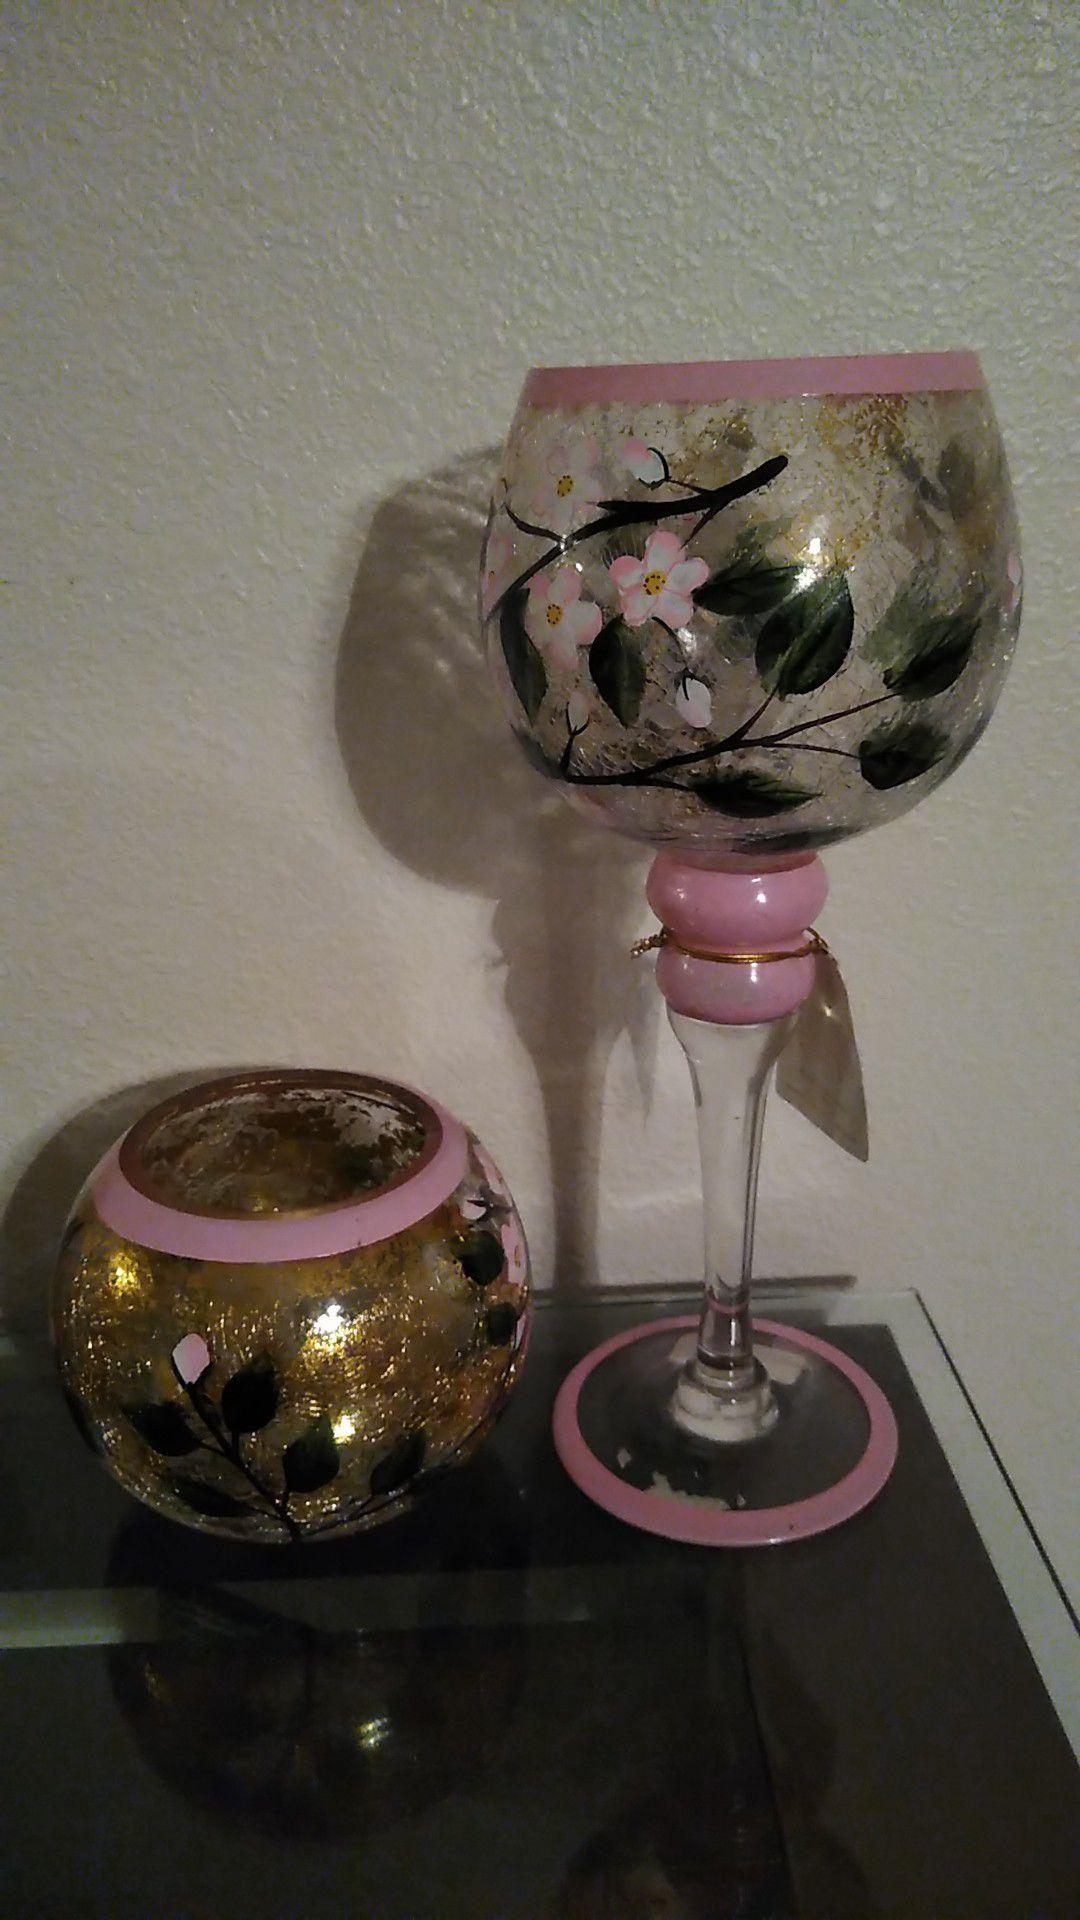 Glass decor set